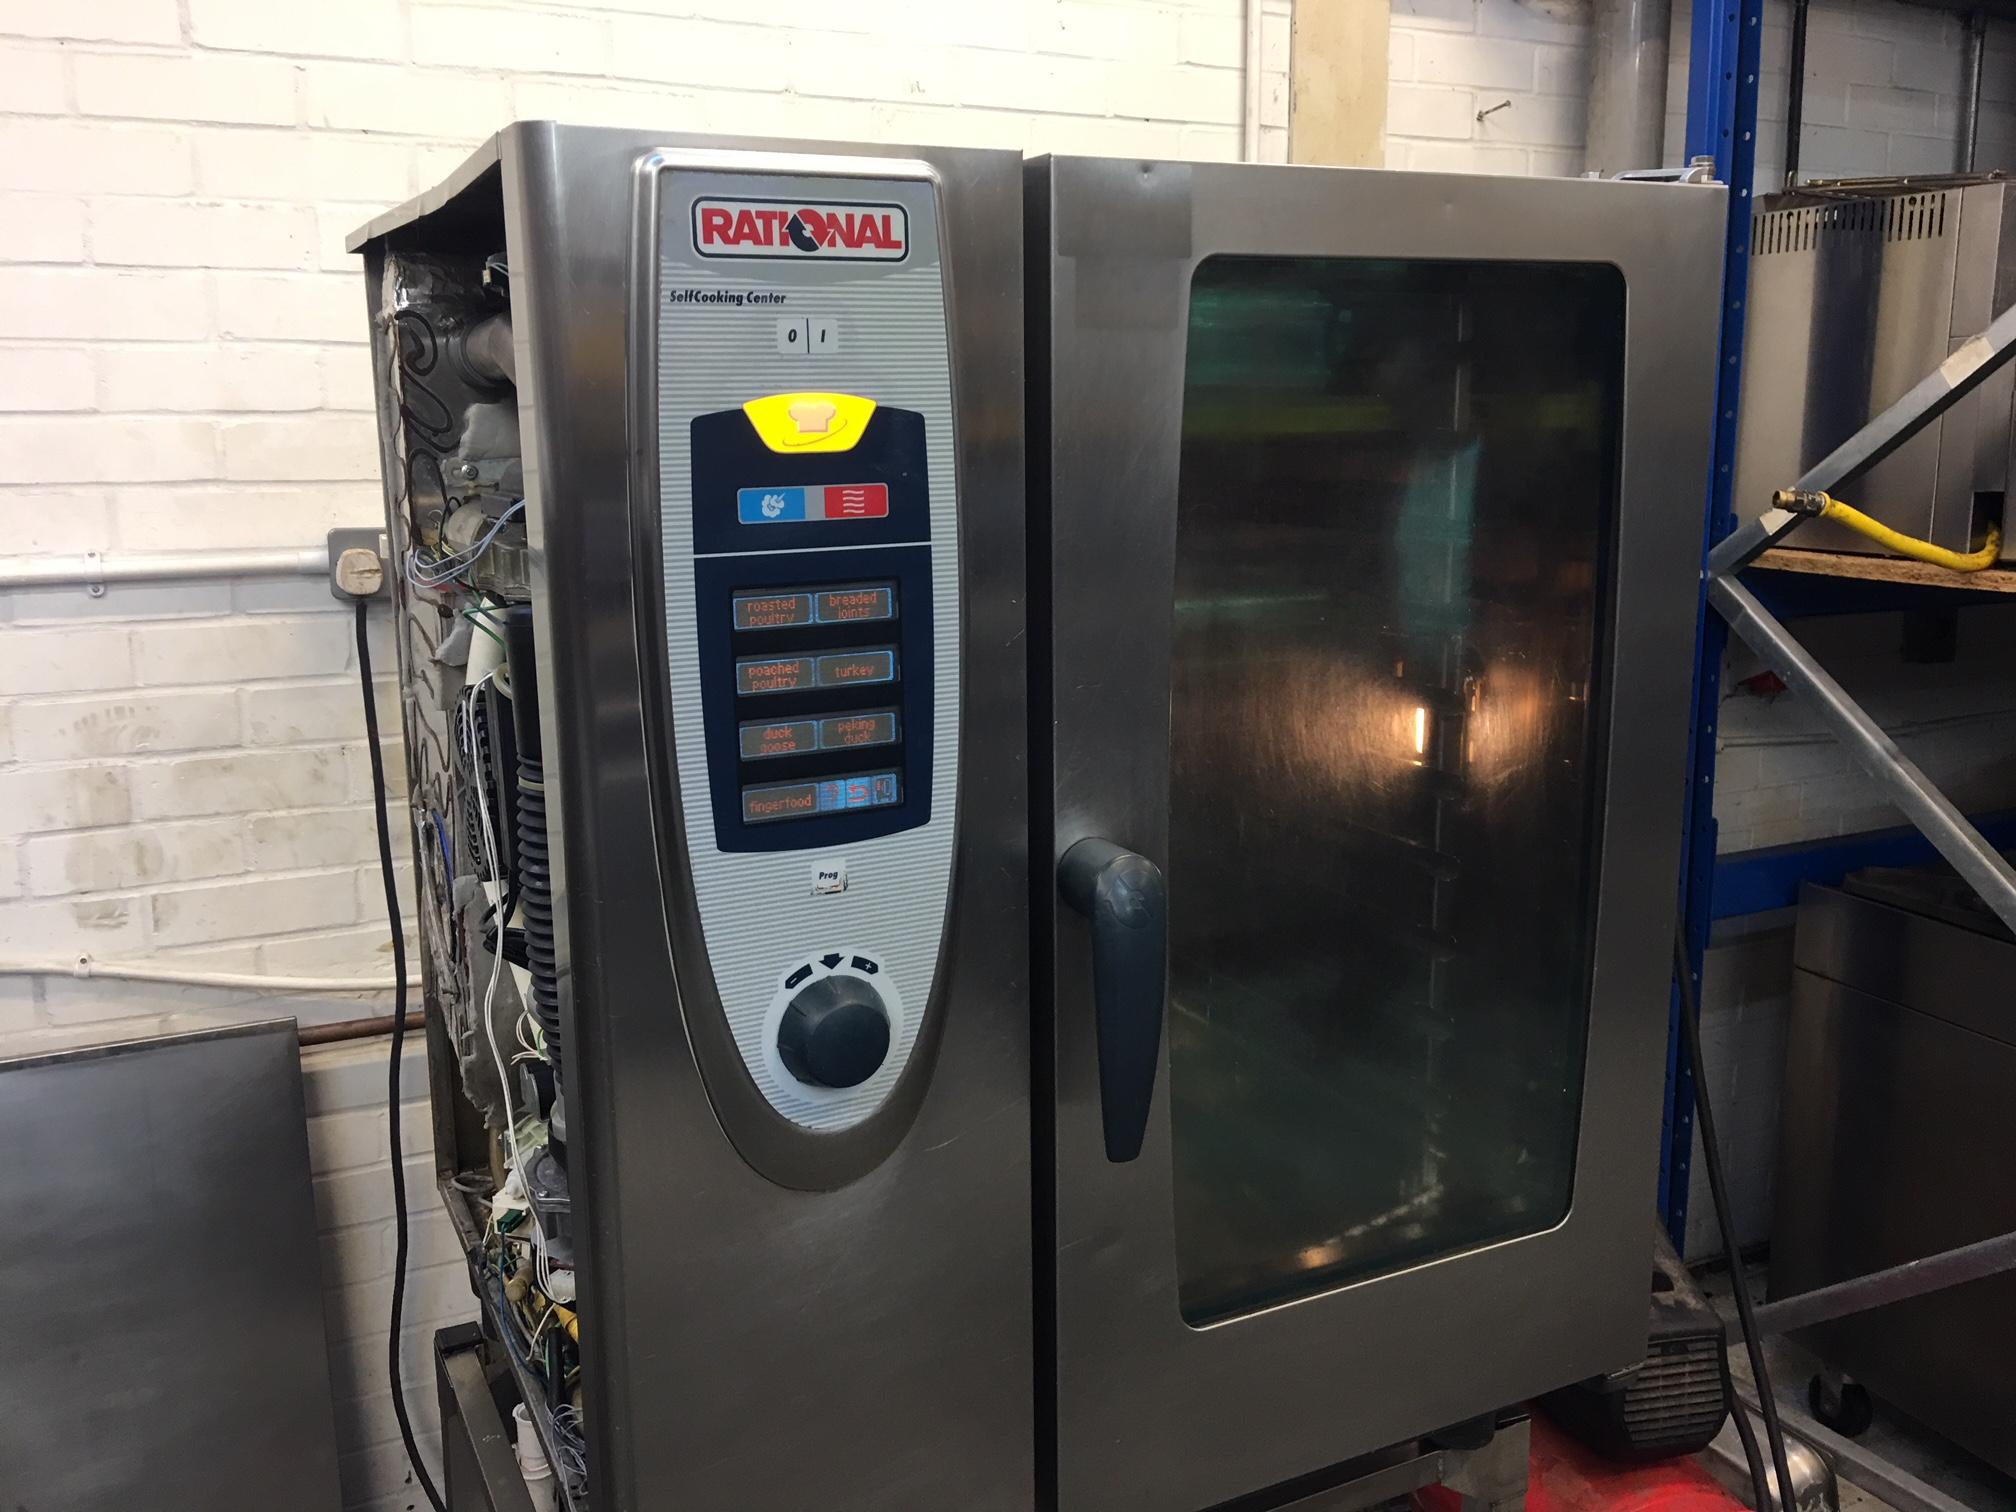 Rational 10 Grid  SCC101E  Oven,  combi oven 3 phase peri peri oven